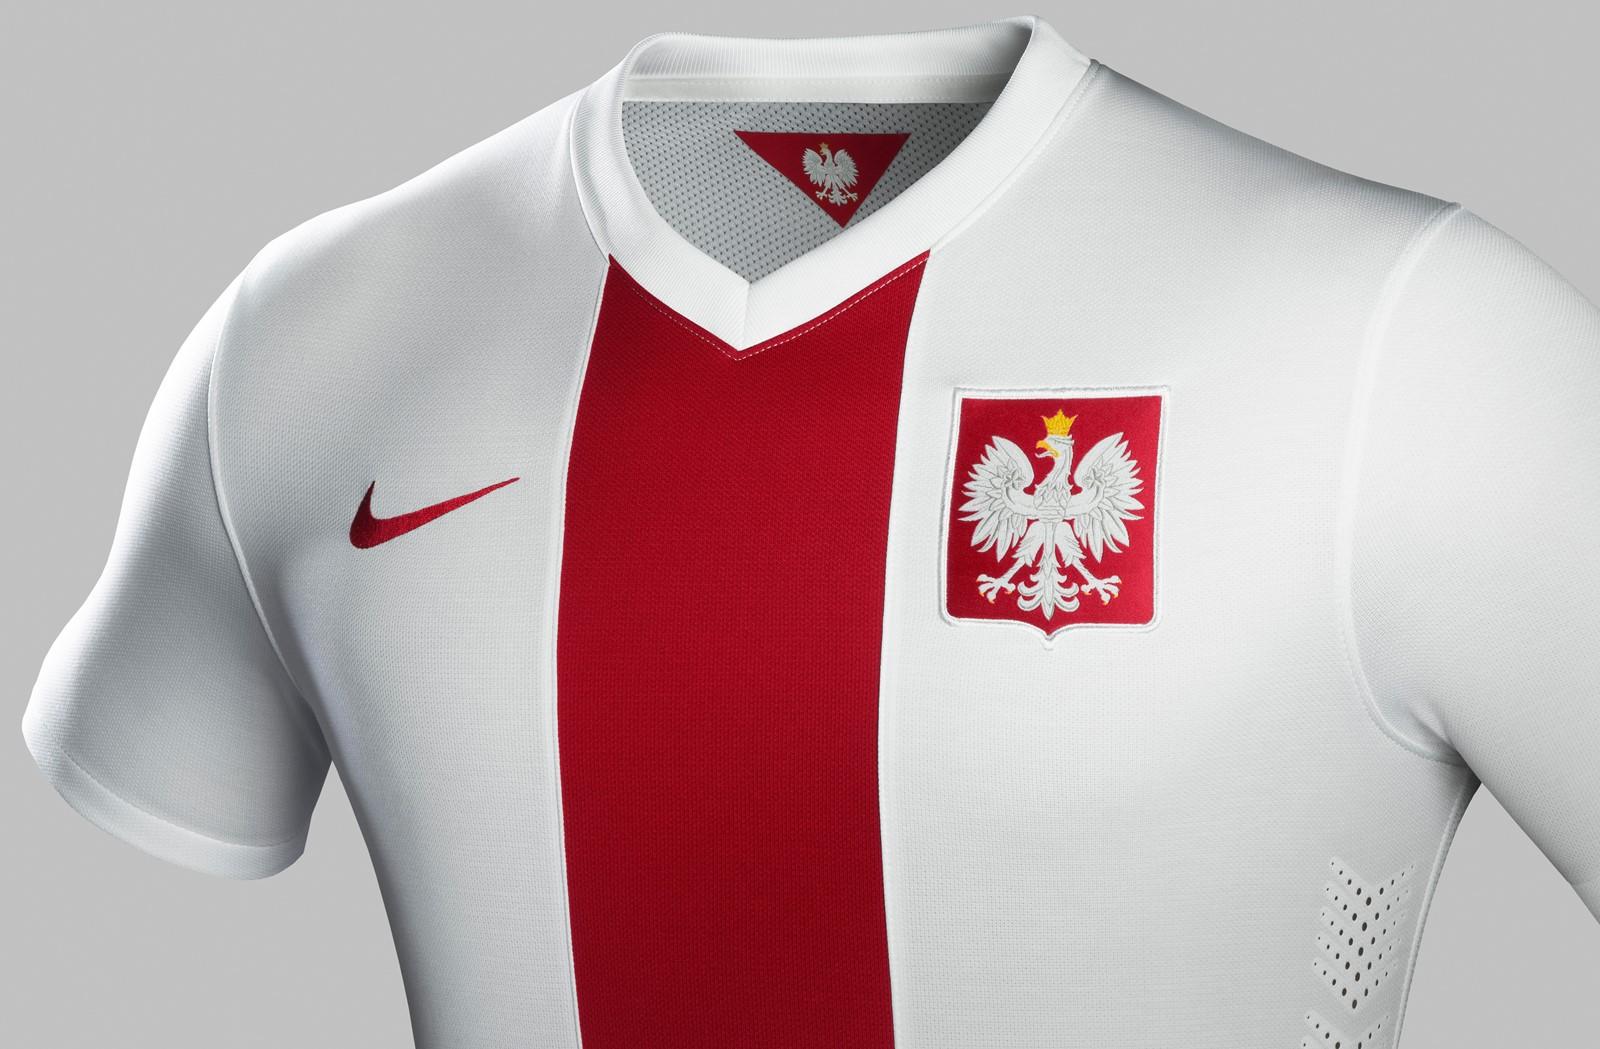 polnische nationalmannschaft logo 4181314 academia